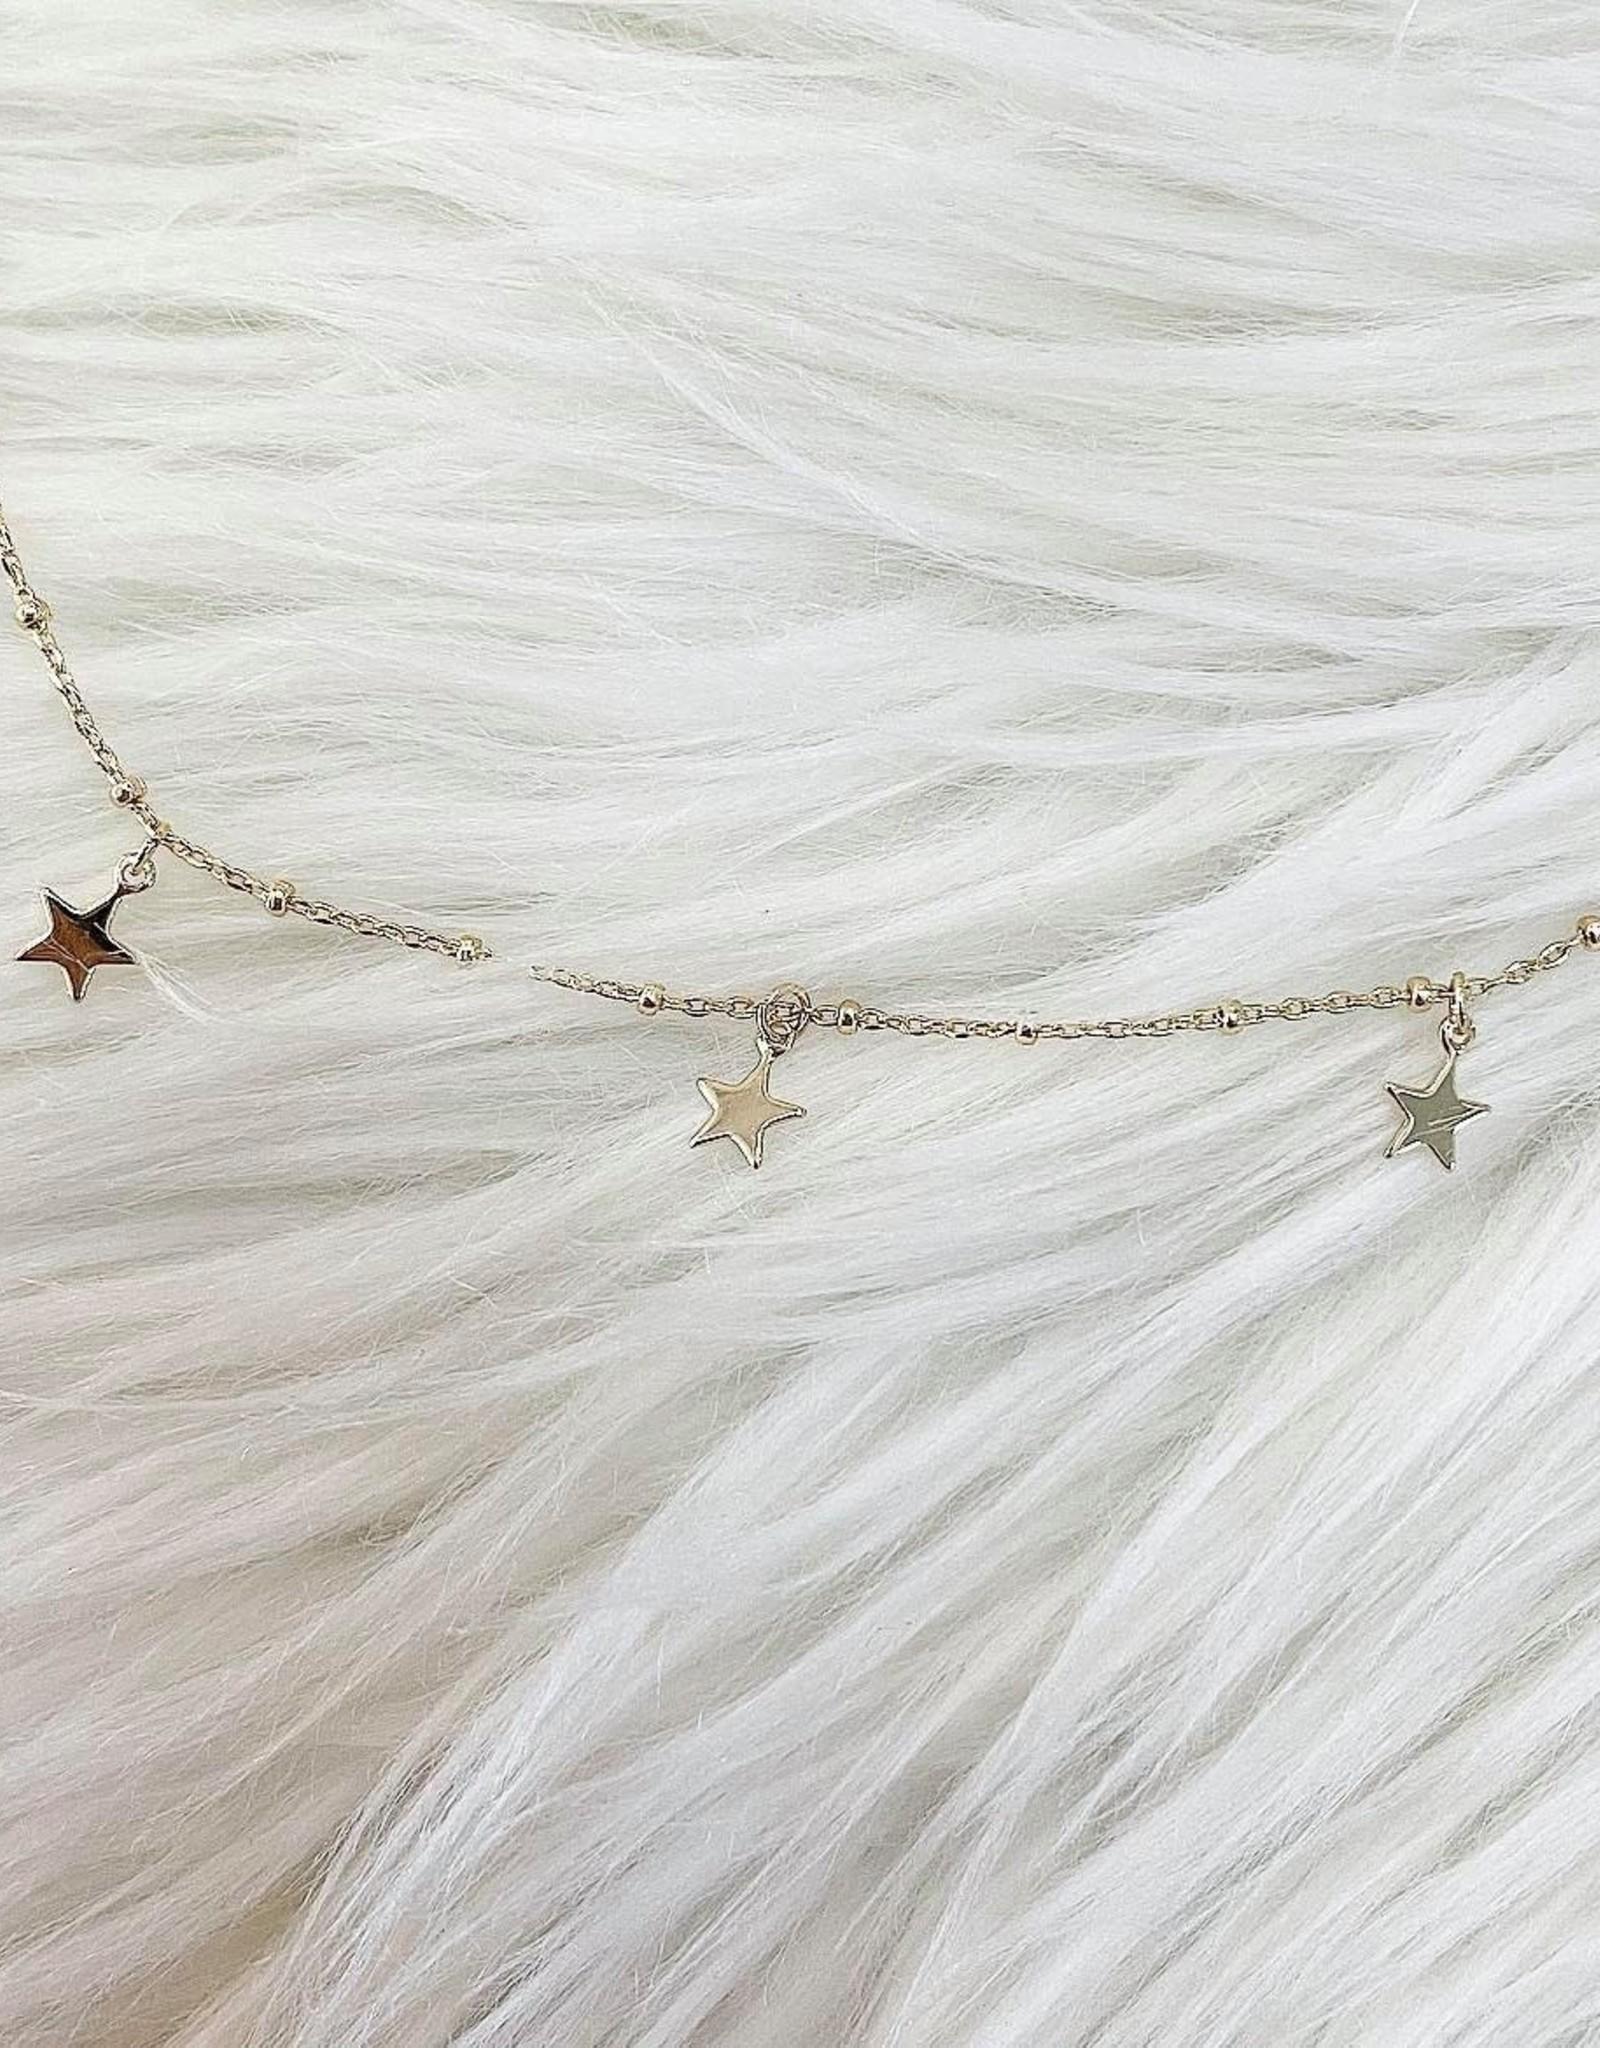 Strand of Stars Necklace